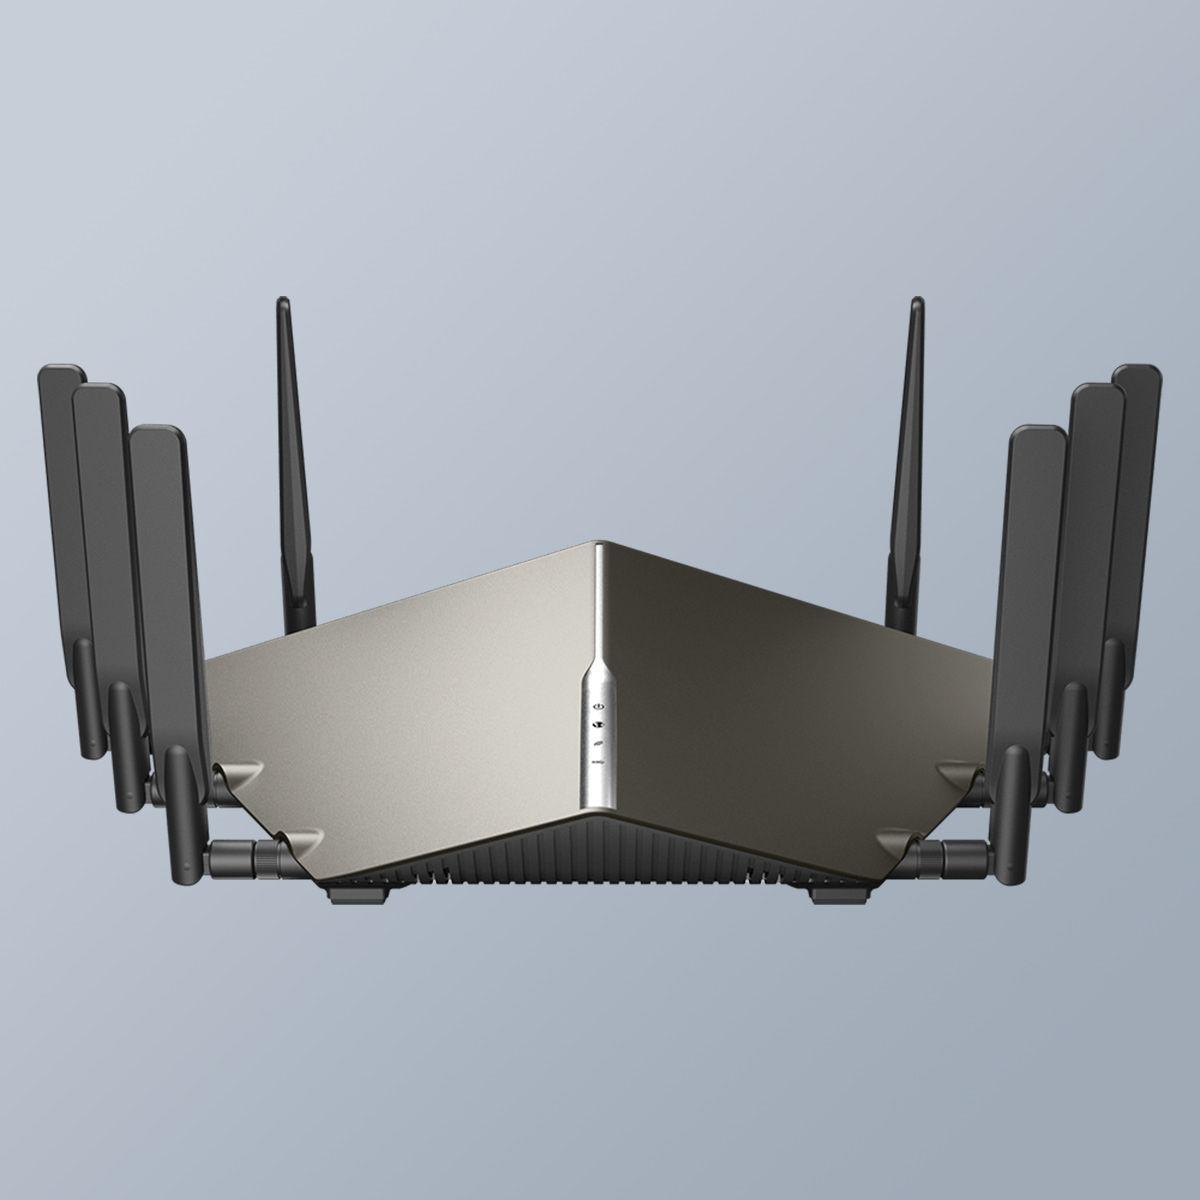 D-Link DIR-X6060 AX6000 Wi-Fi 6 Router